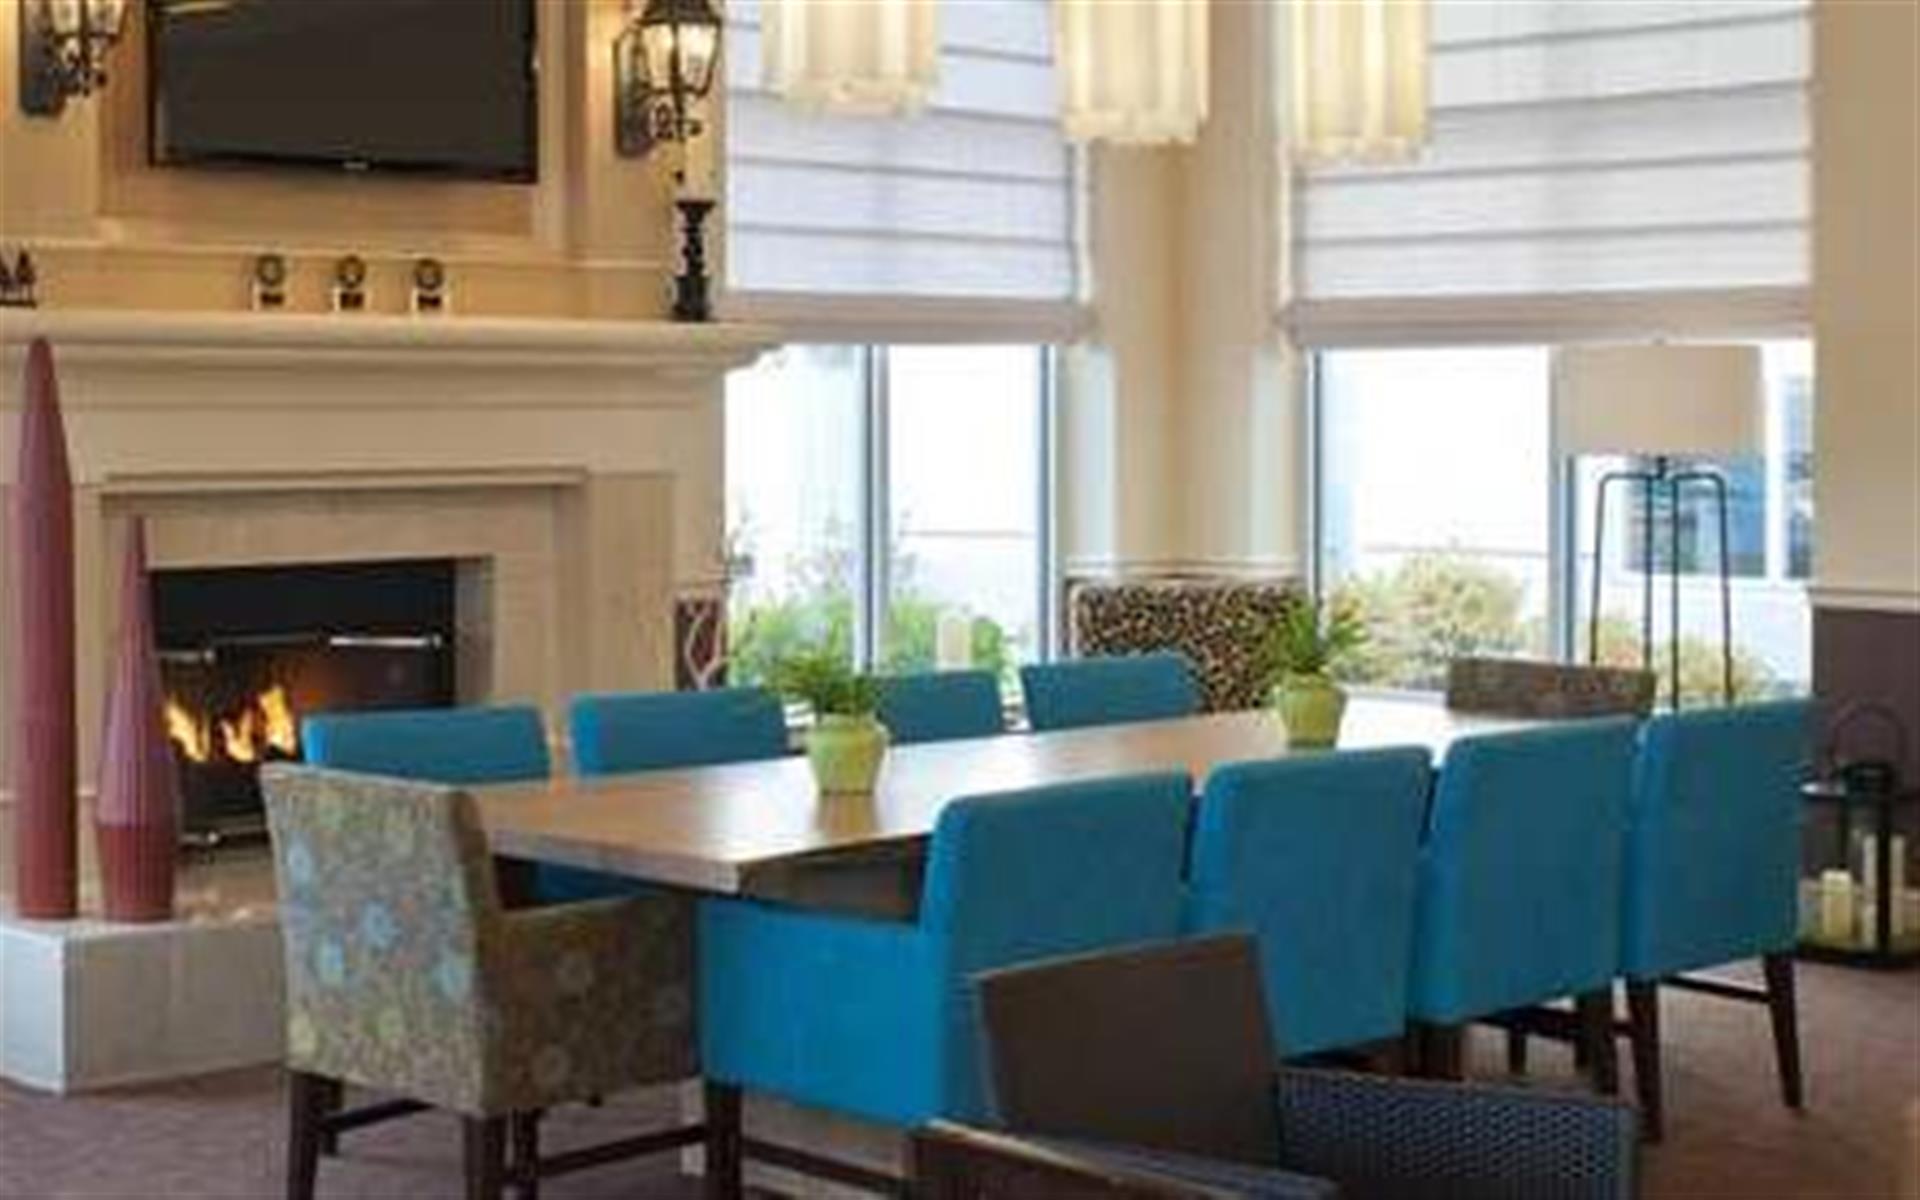 Hilton Garden Inn Minneapolis/Maple Grove - Conference Table